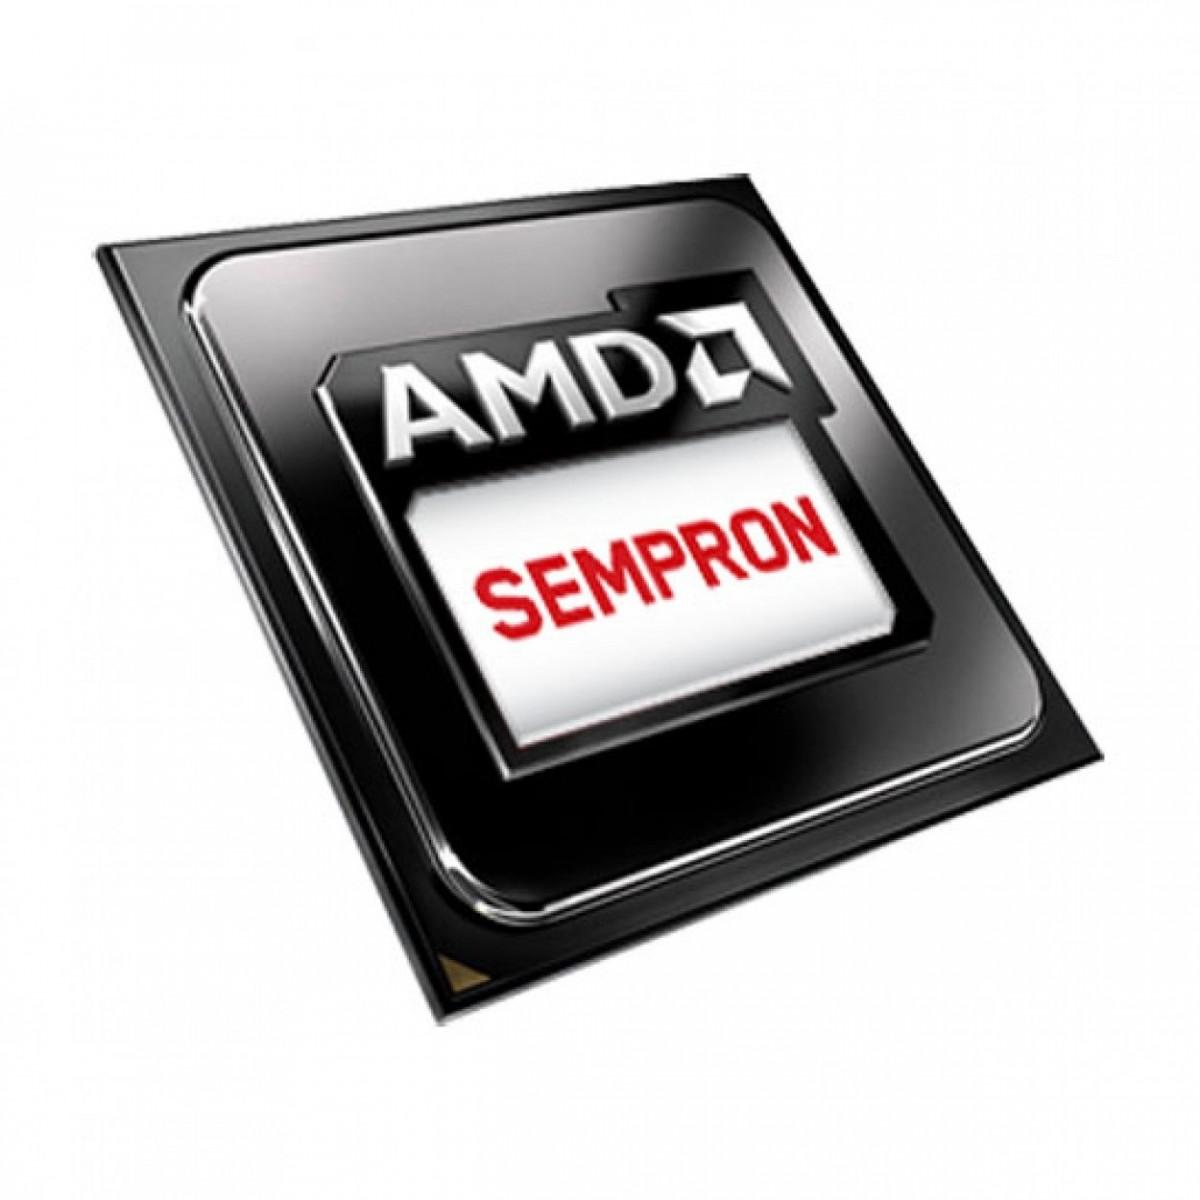 Processador AMD Sempron 2600+ 128K Cache / 1600 MHz / 800 MHz - Seminovo